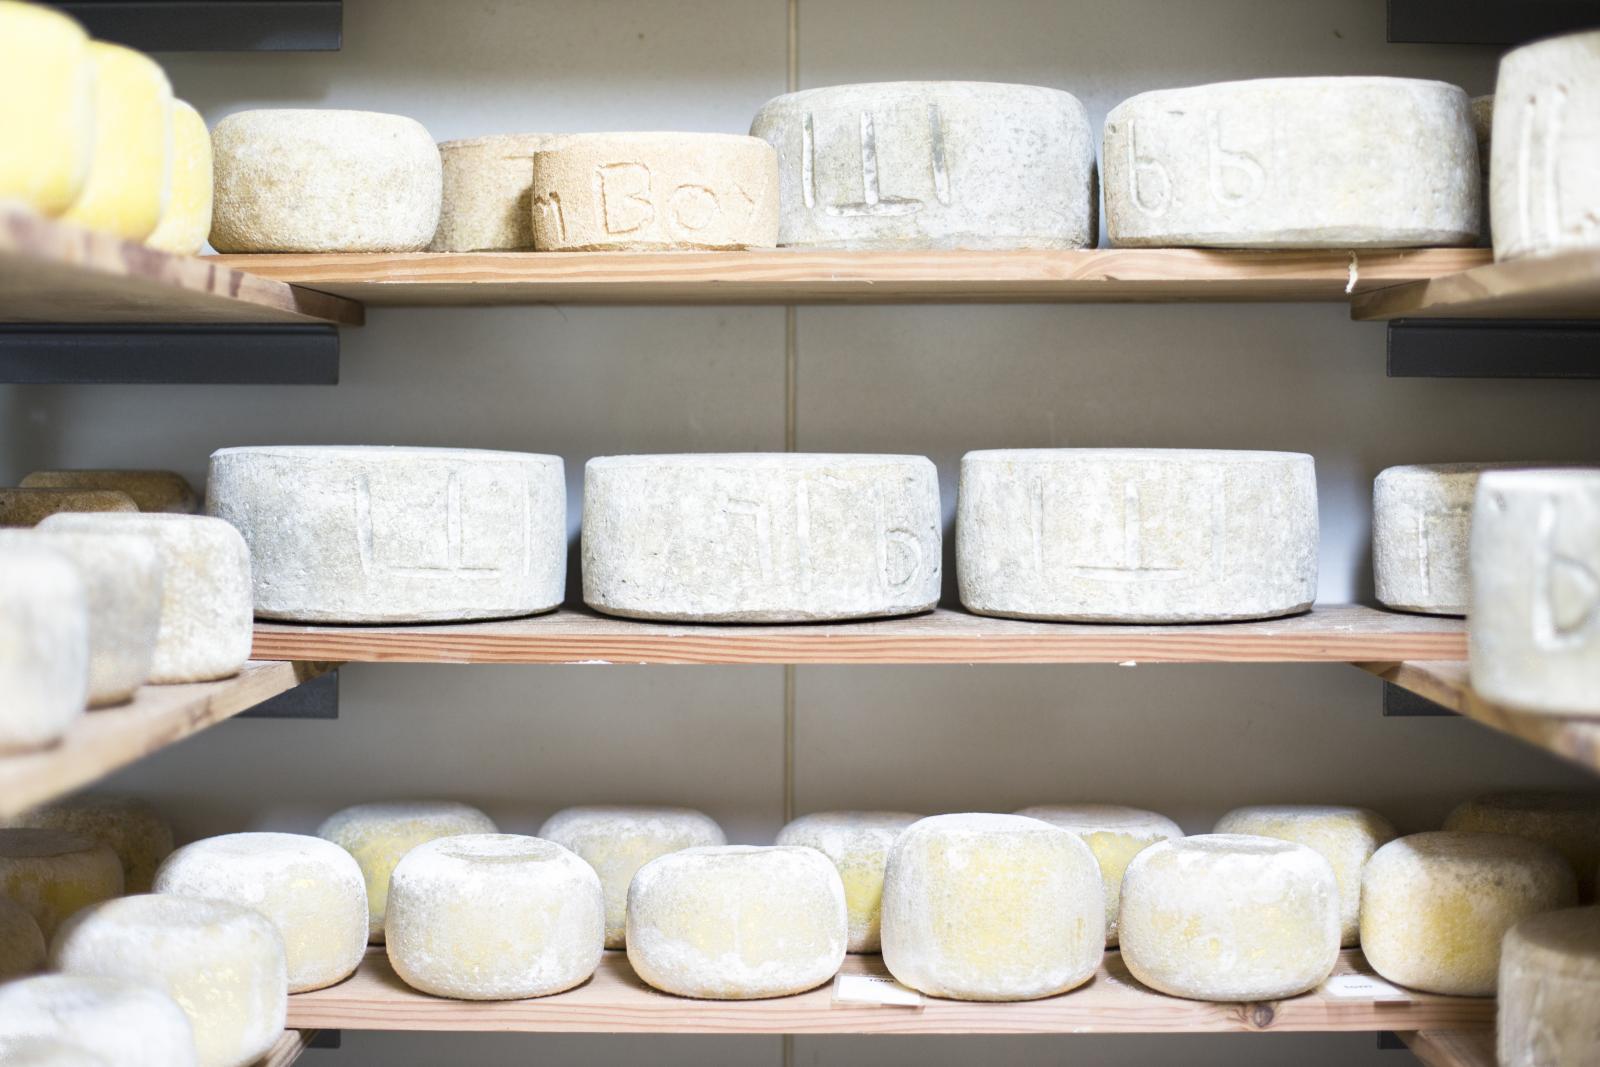 Bruny Island cheese near Hobart Tasmania